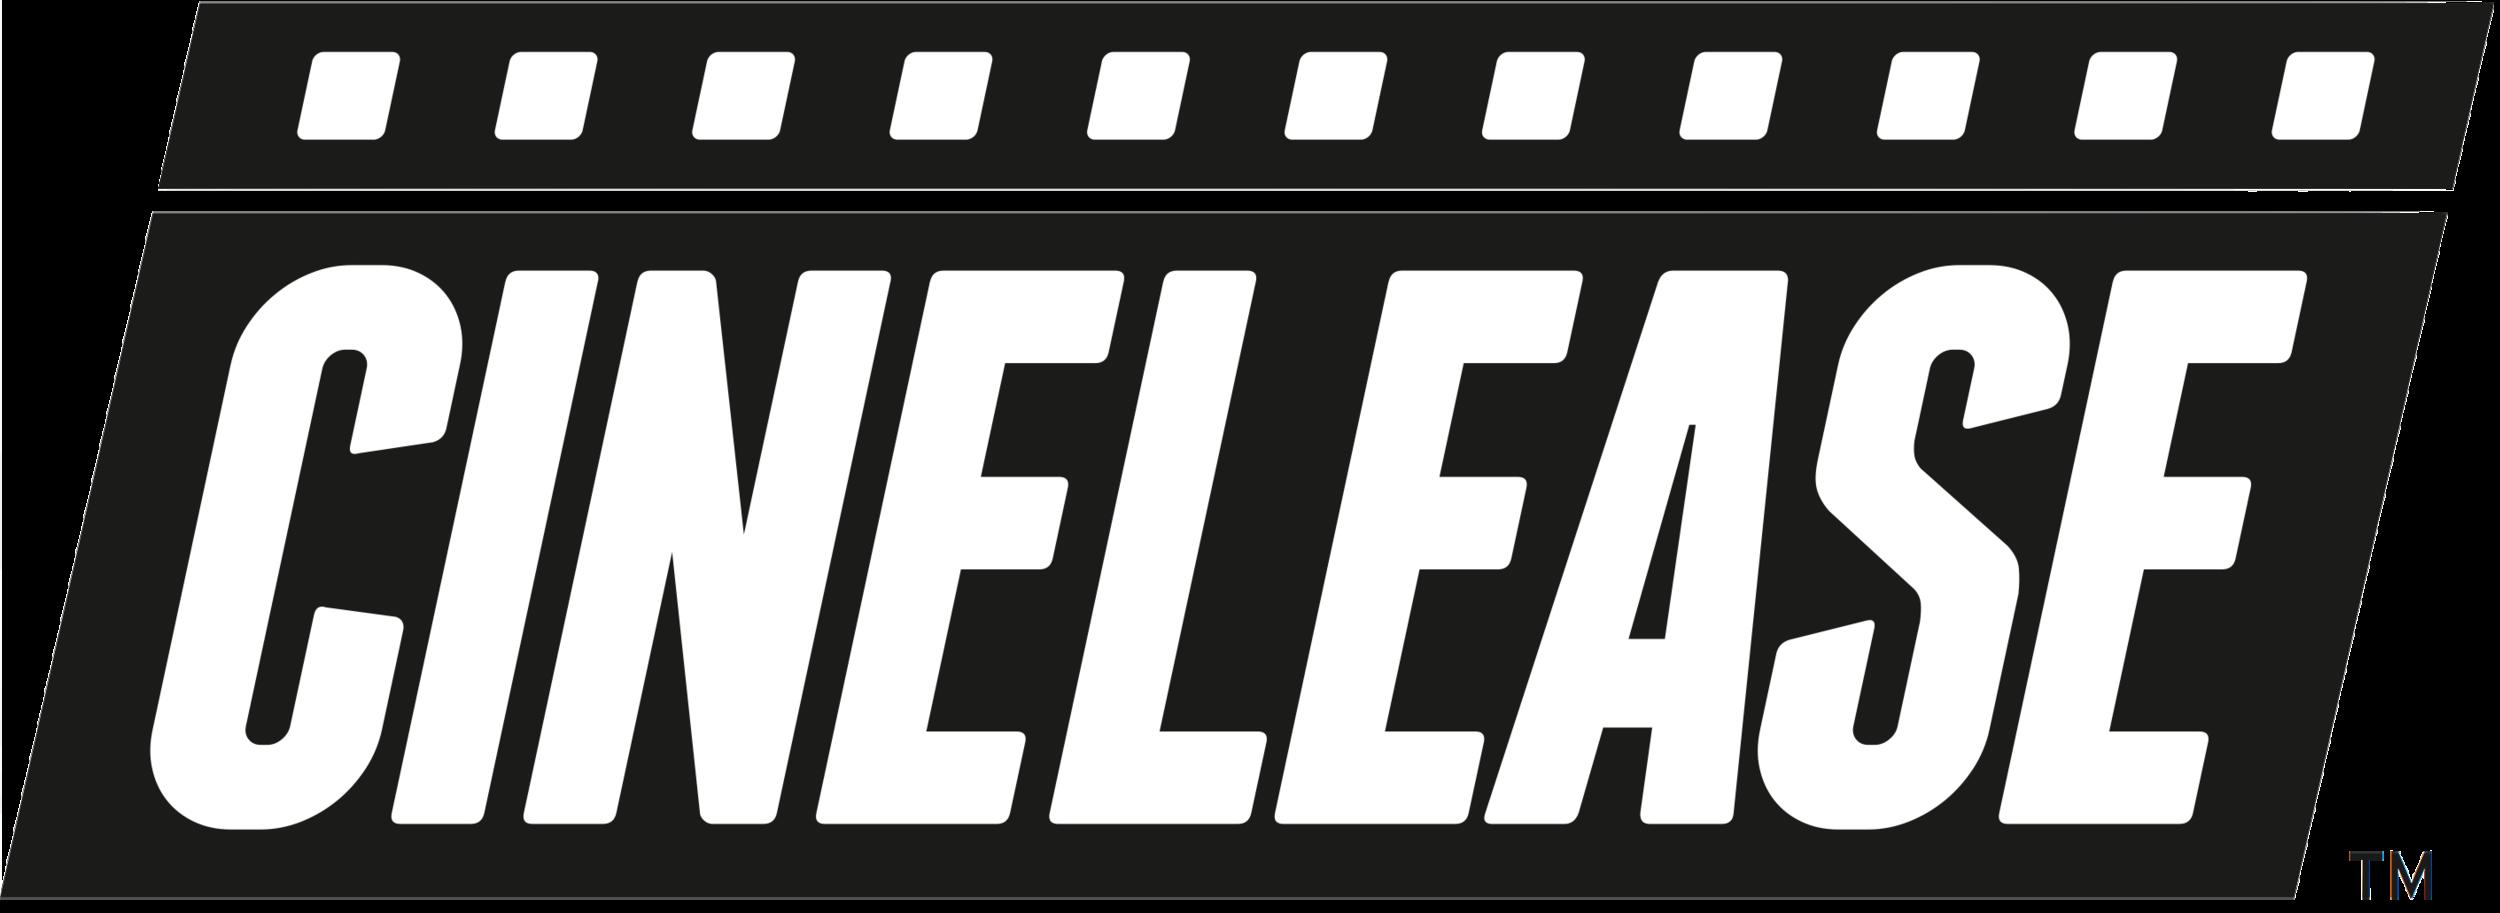 Cinelease-Logo-Original.png